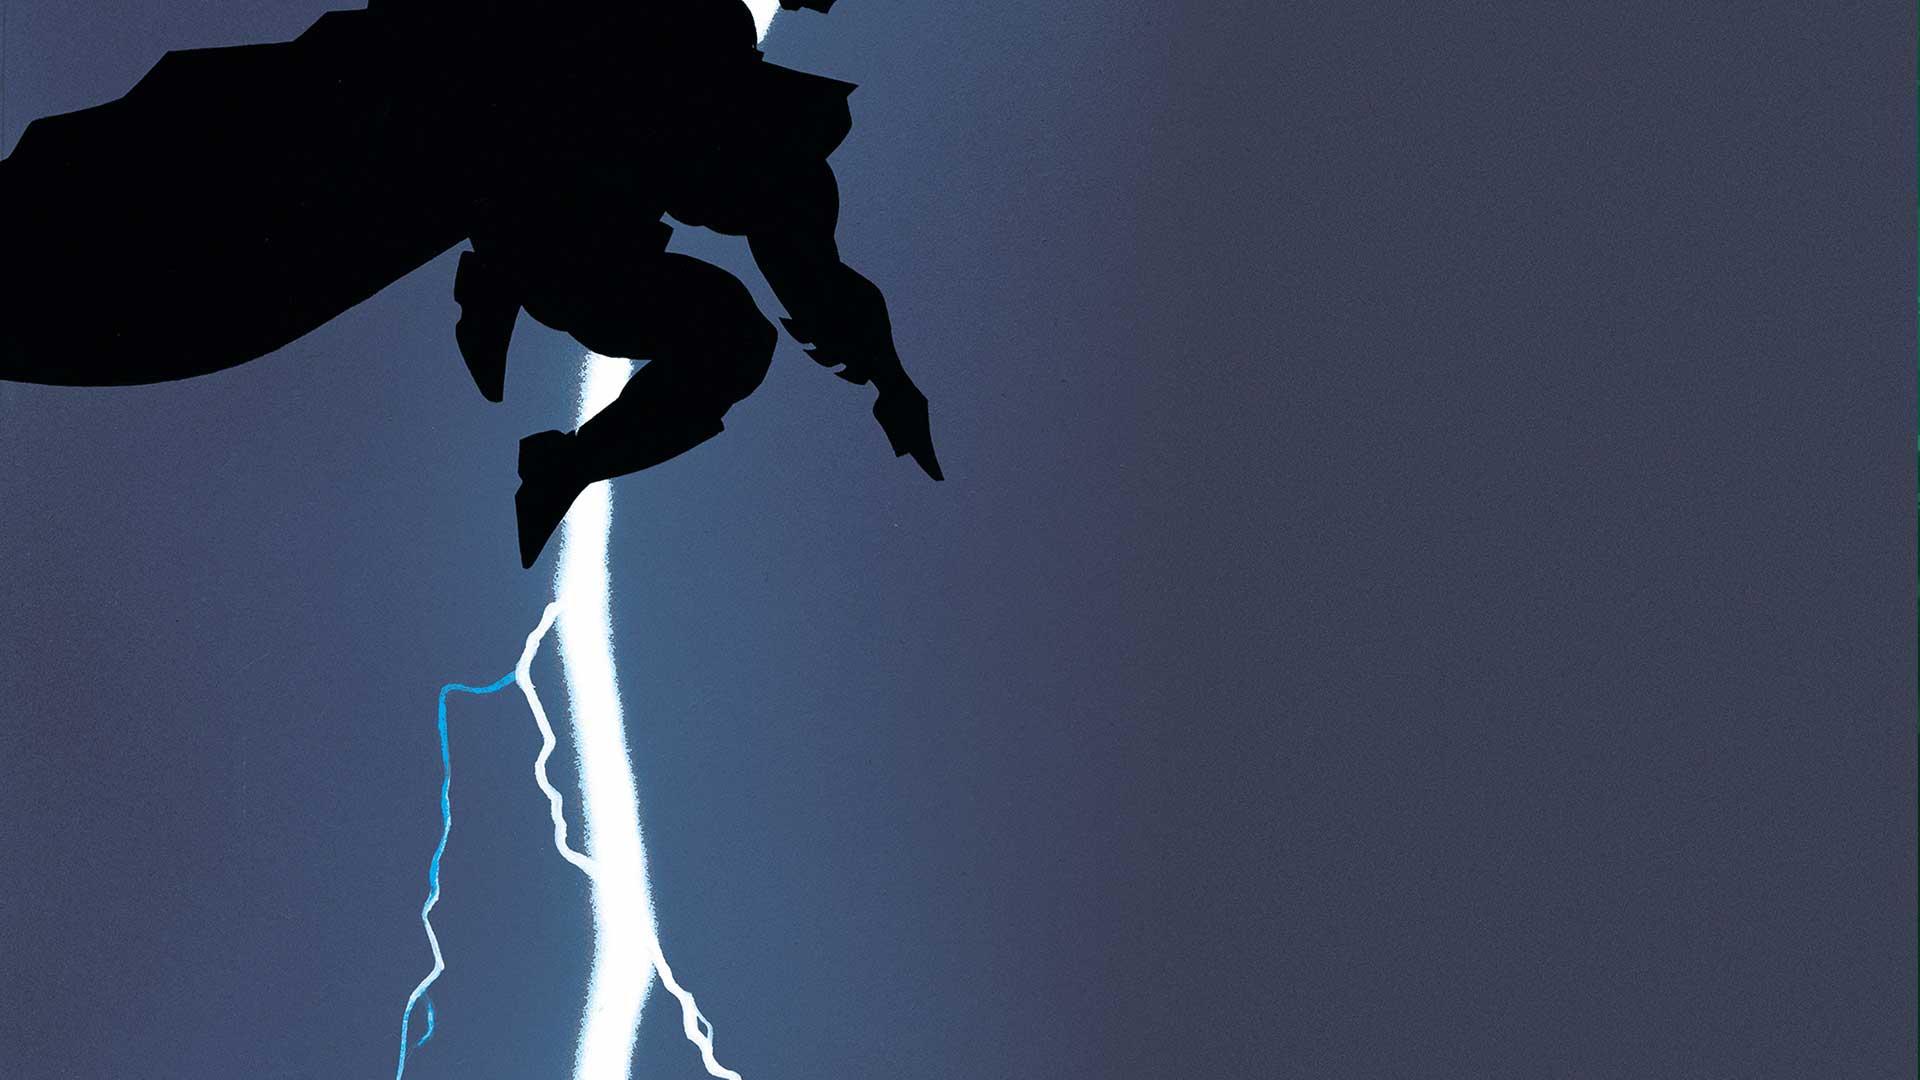 Free Download The Dark Knight Returns Wallpapers Pk31 Hdq The Dark